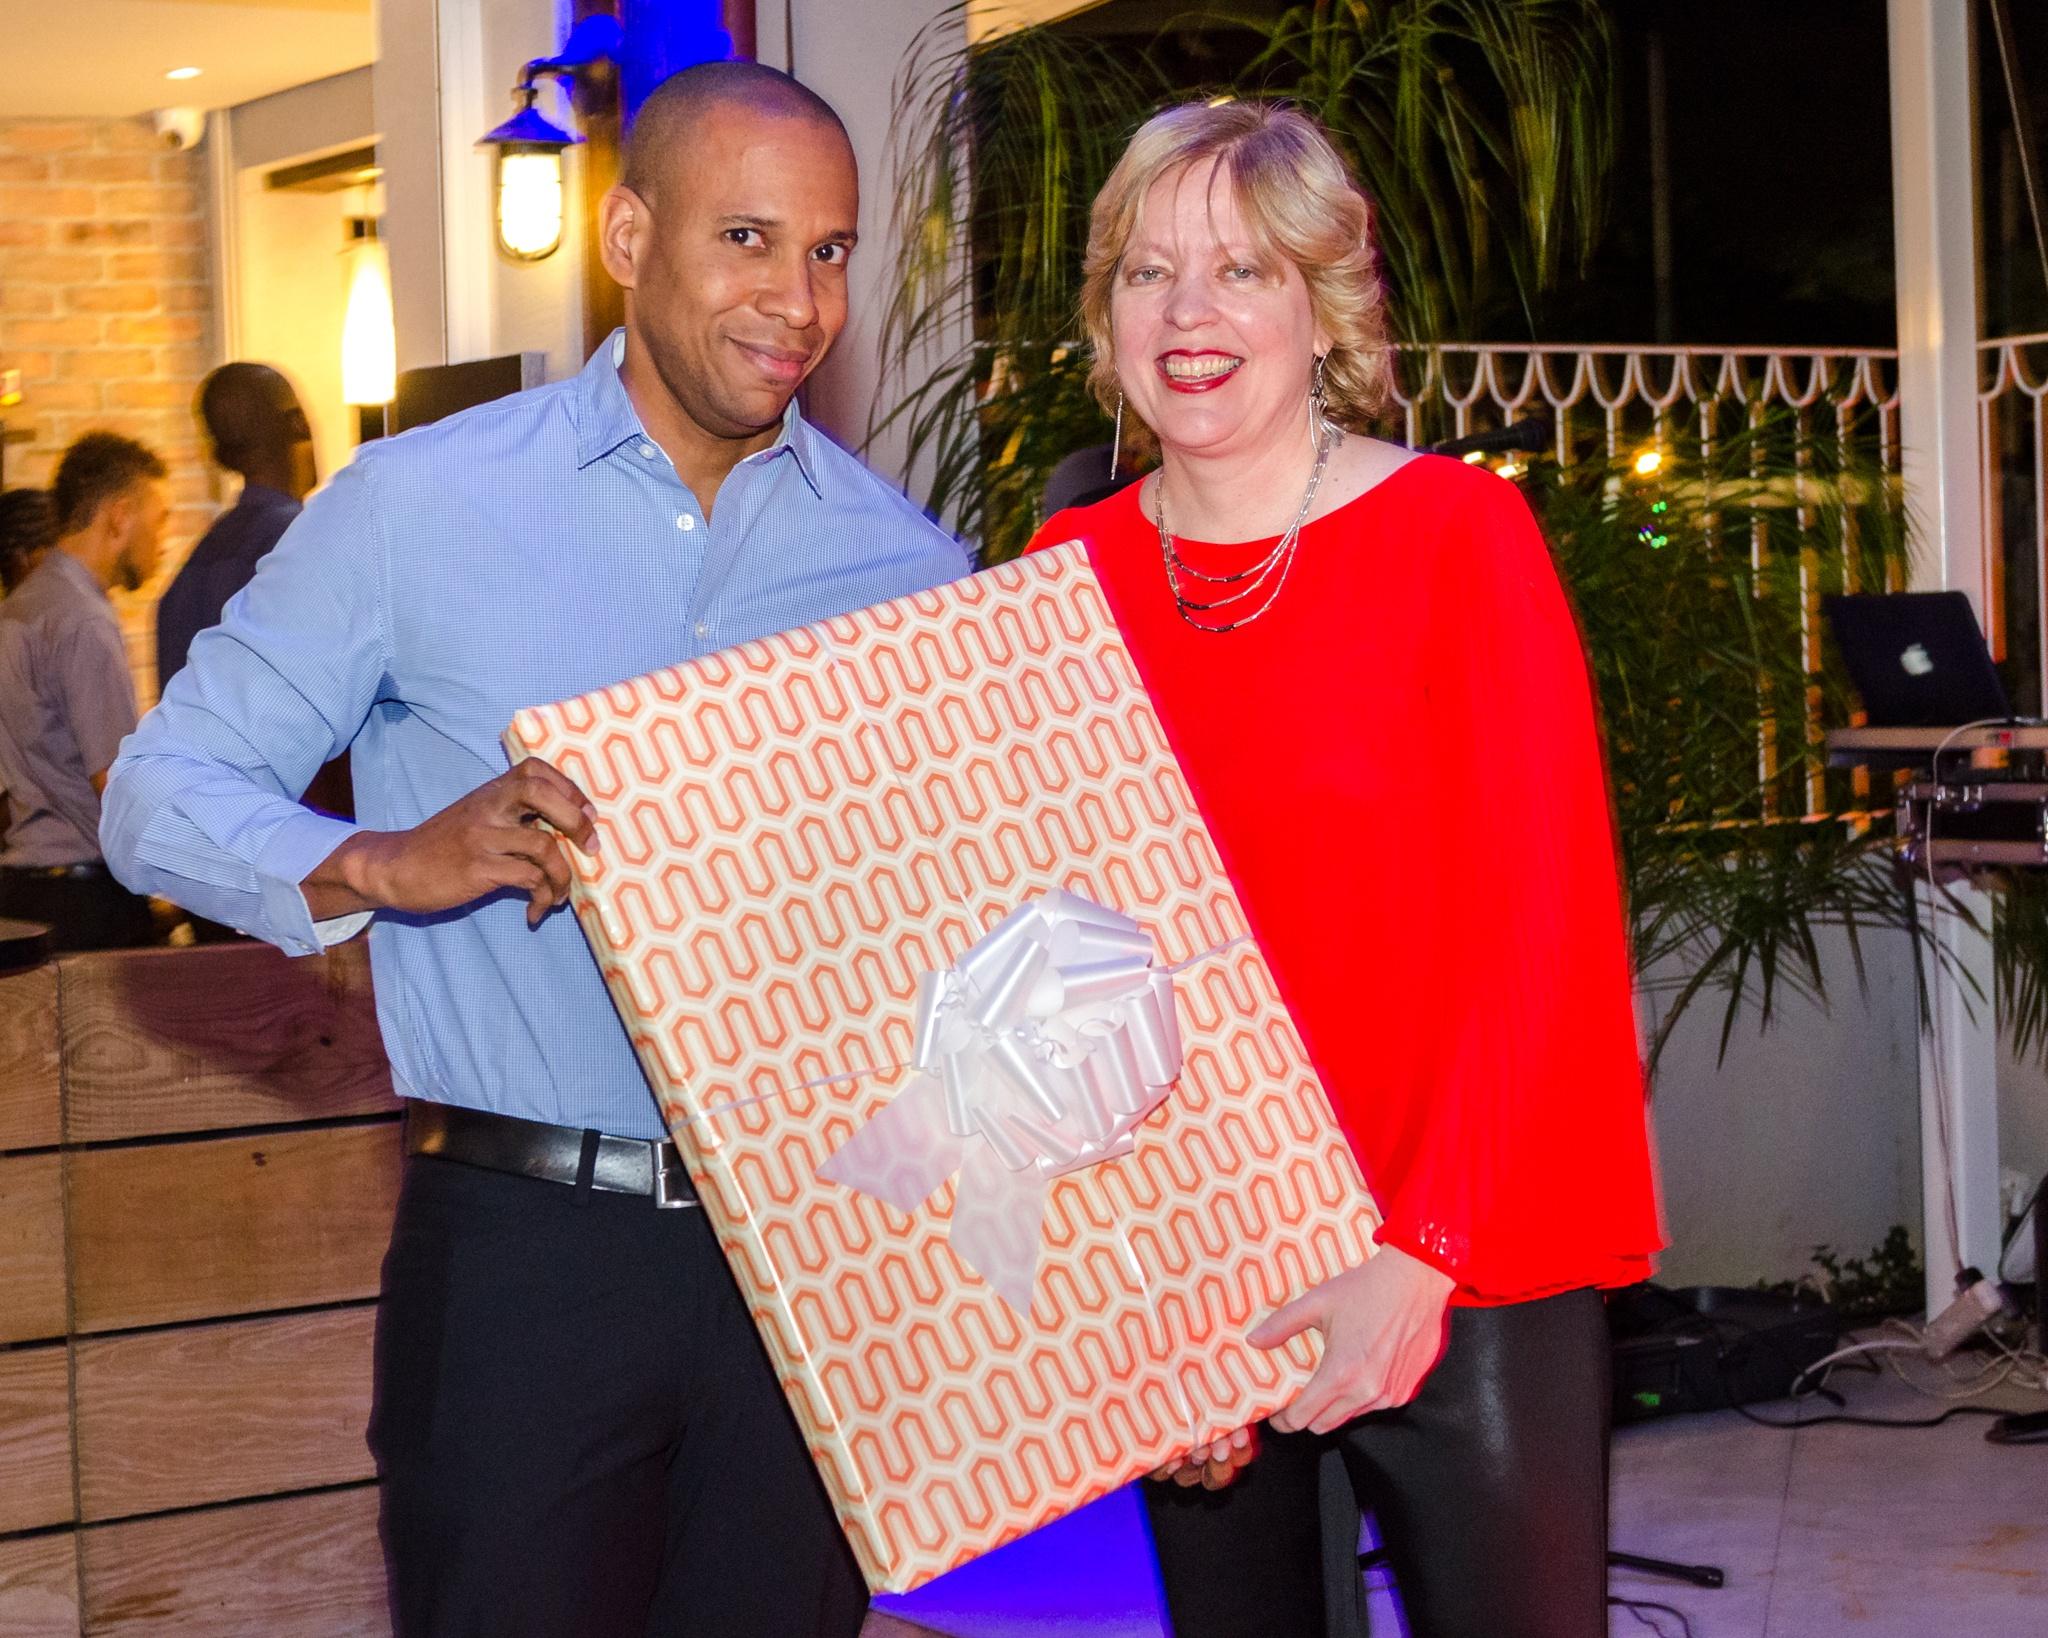 Anya Schnoor, Scotiabank's Head Caribbean South and East, presents David Noel's farewell gift - original artwork from his favorite artist